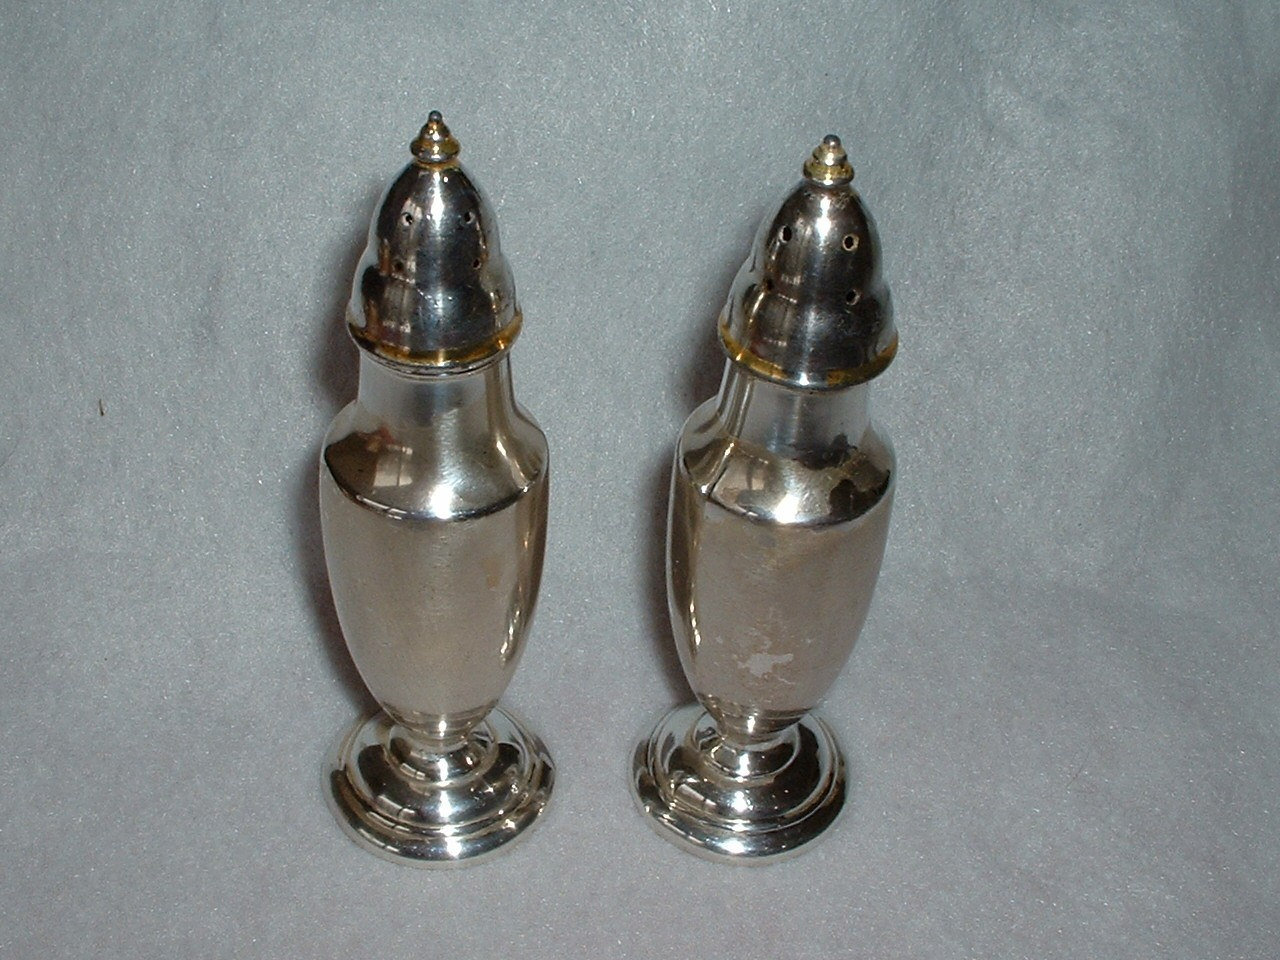 Elegant Vintage Silverplate Salt and Pepper Shakers